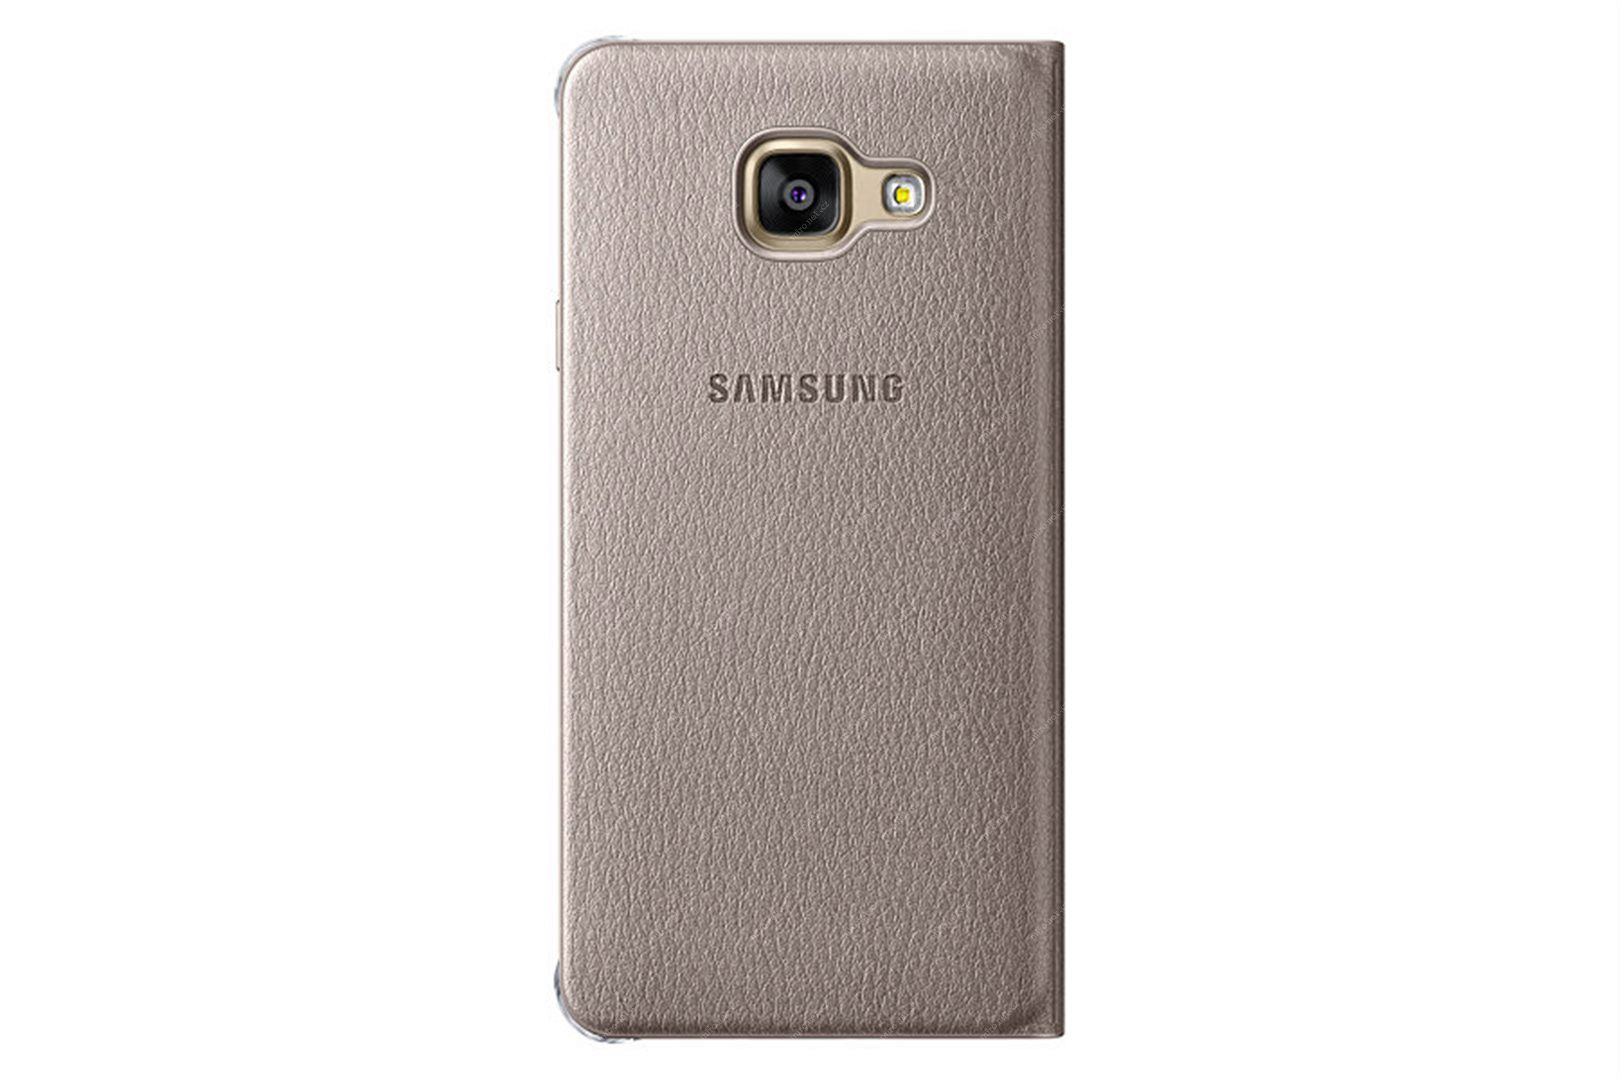 EF-WA310PFE Samsung Folio Pouzdro Gold pro Galaxy A3 2016 (Pošk. Blister)